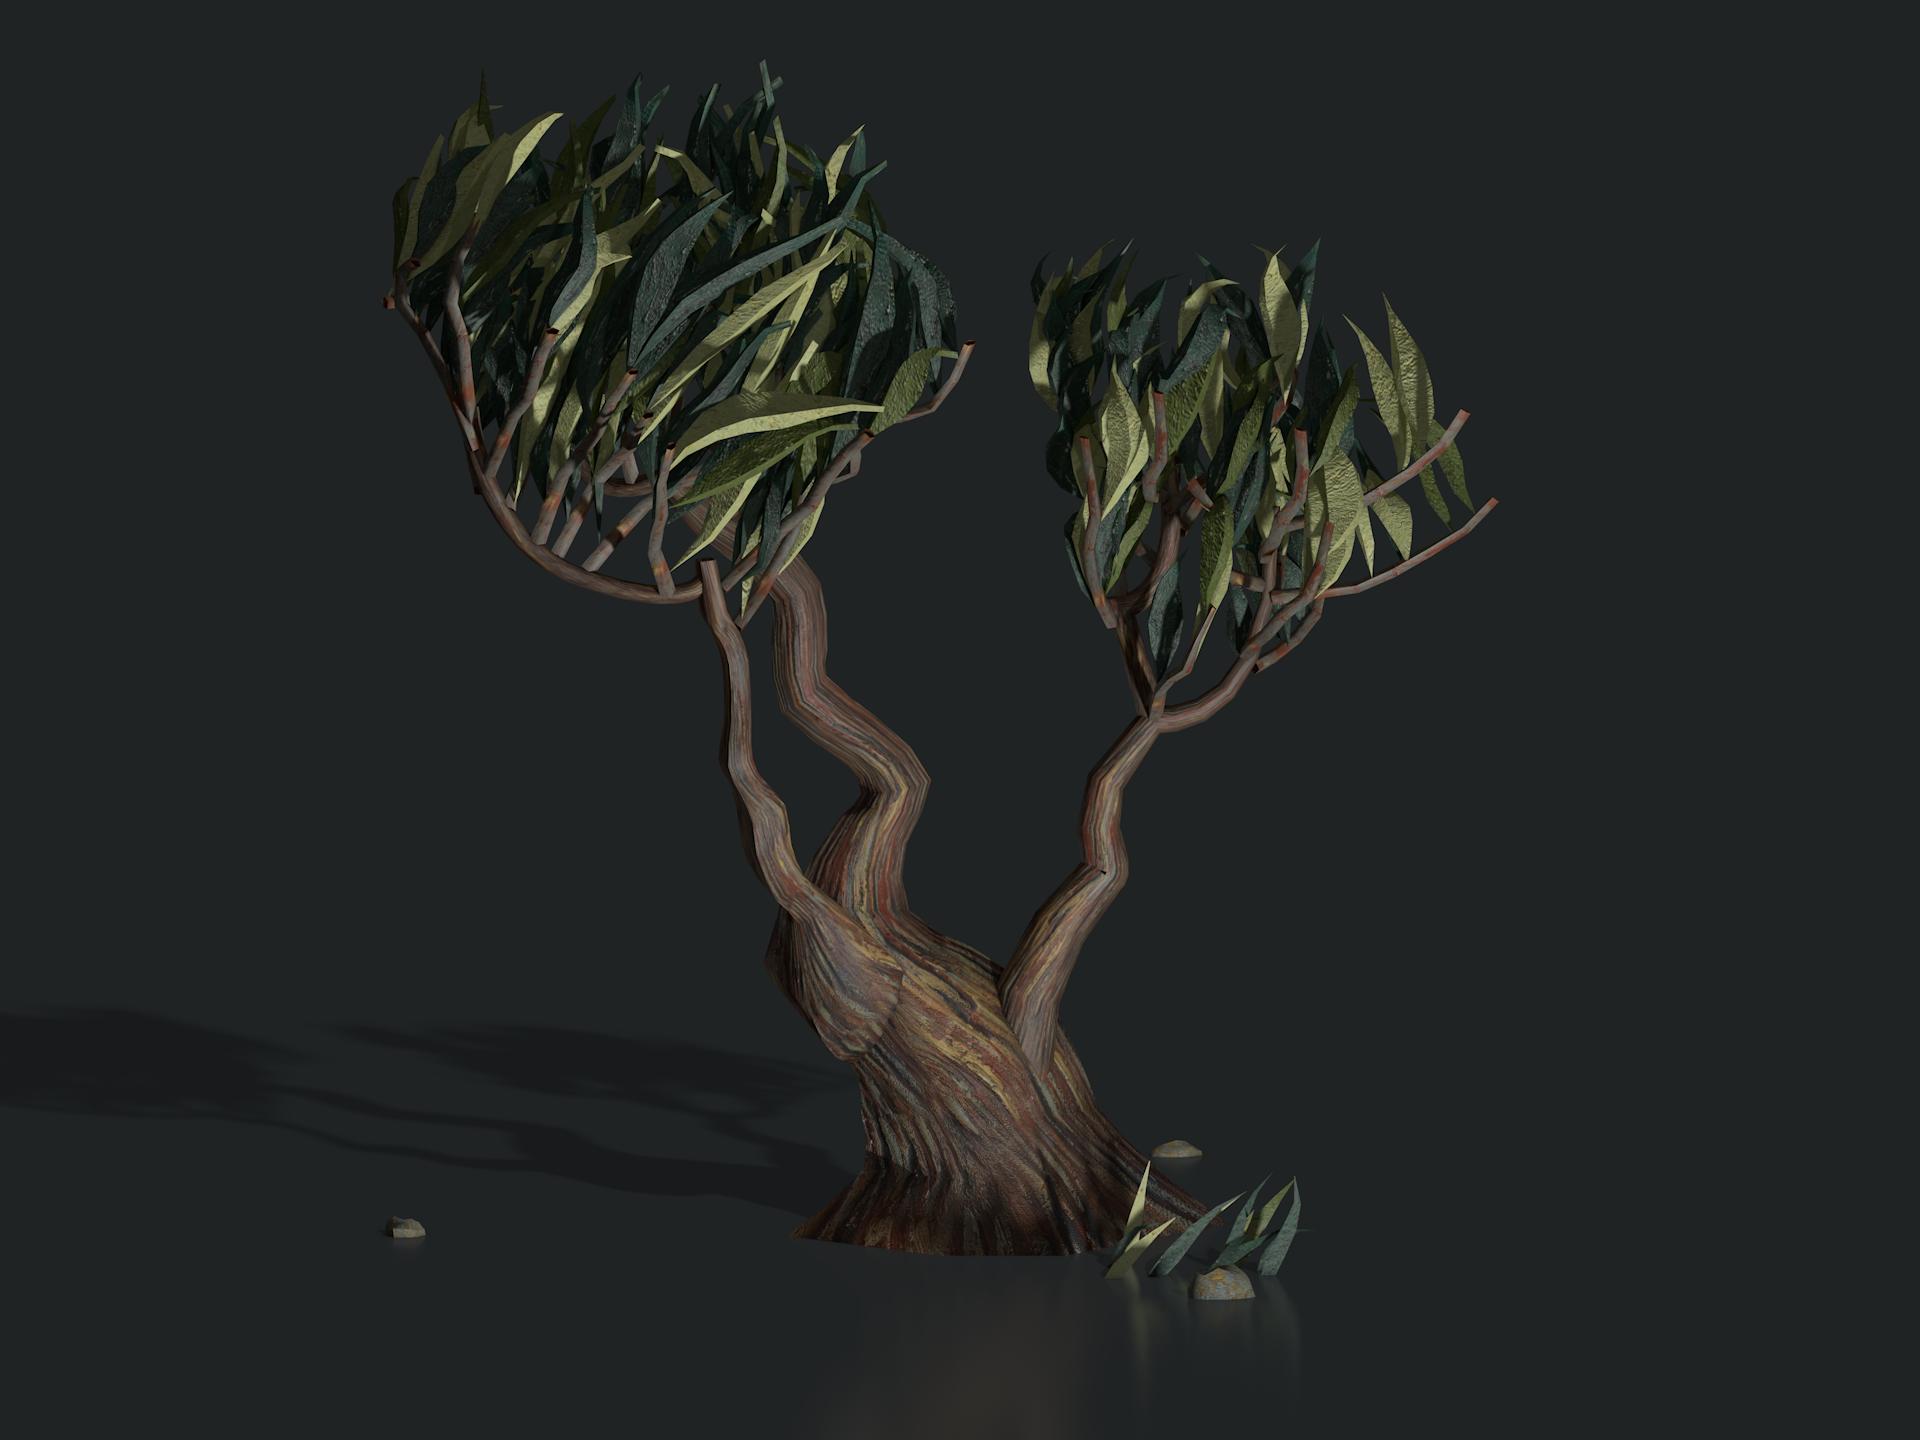 plants_saint_remy_tree1302.png